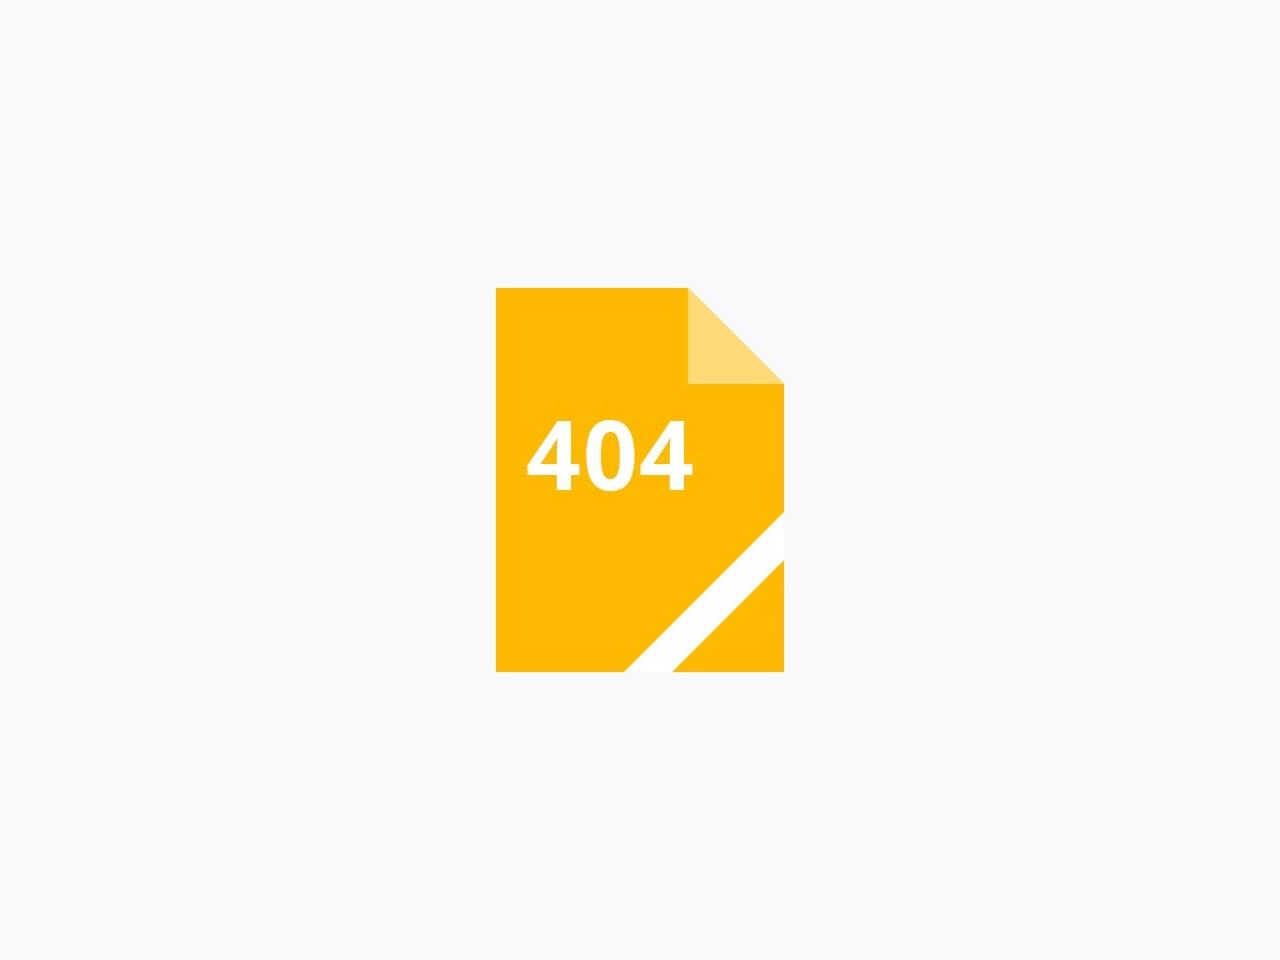 新潟菜の花法律事務所